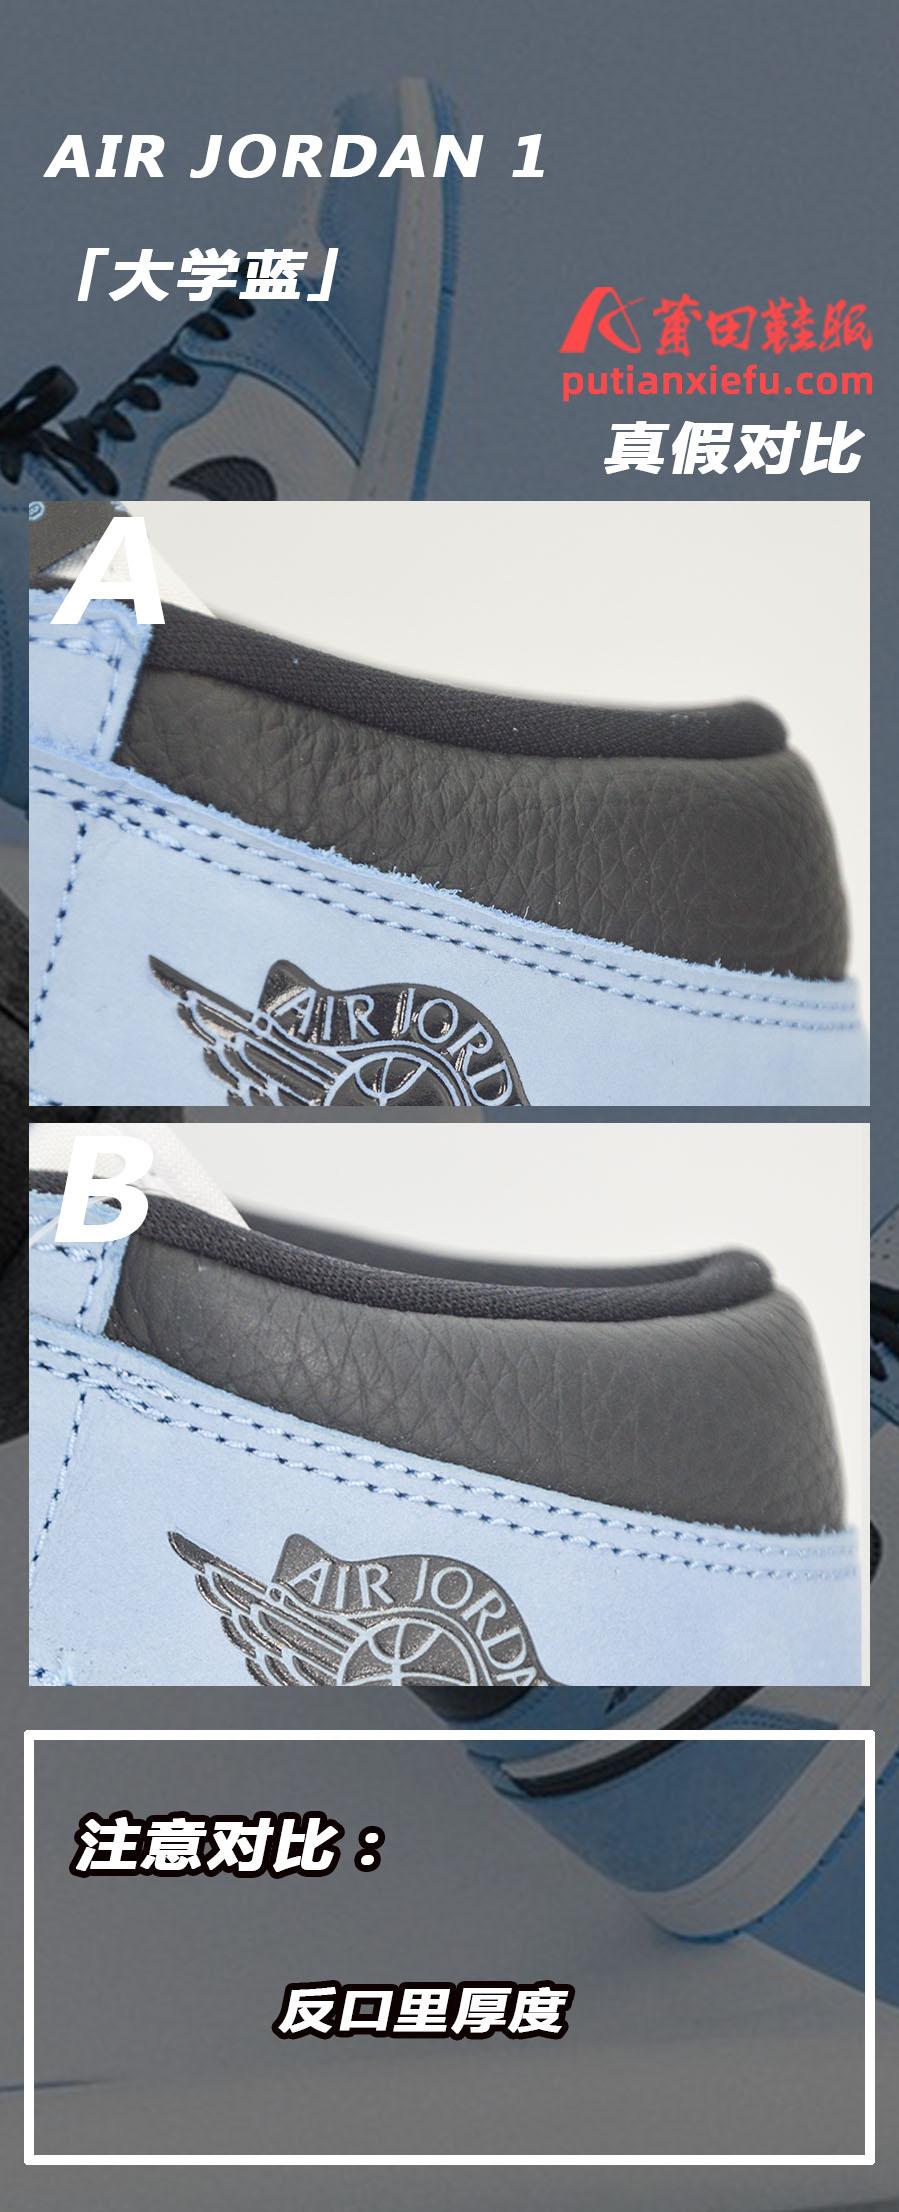 Air Jordan 1 University Blue 大学蓝 真假对比